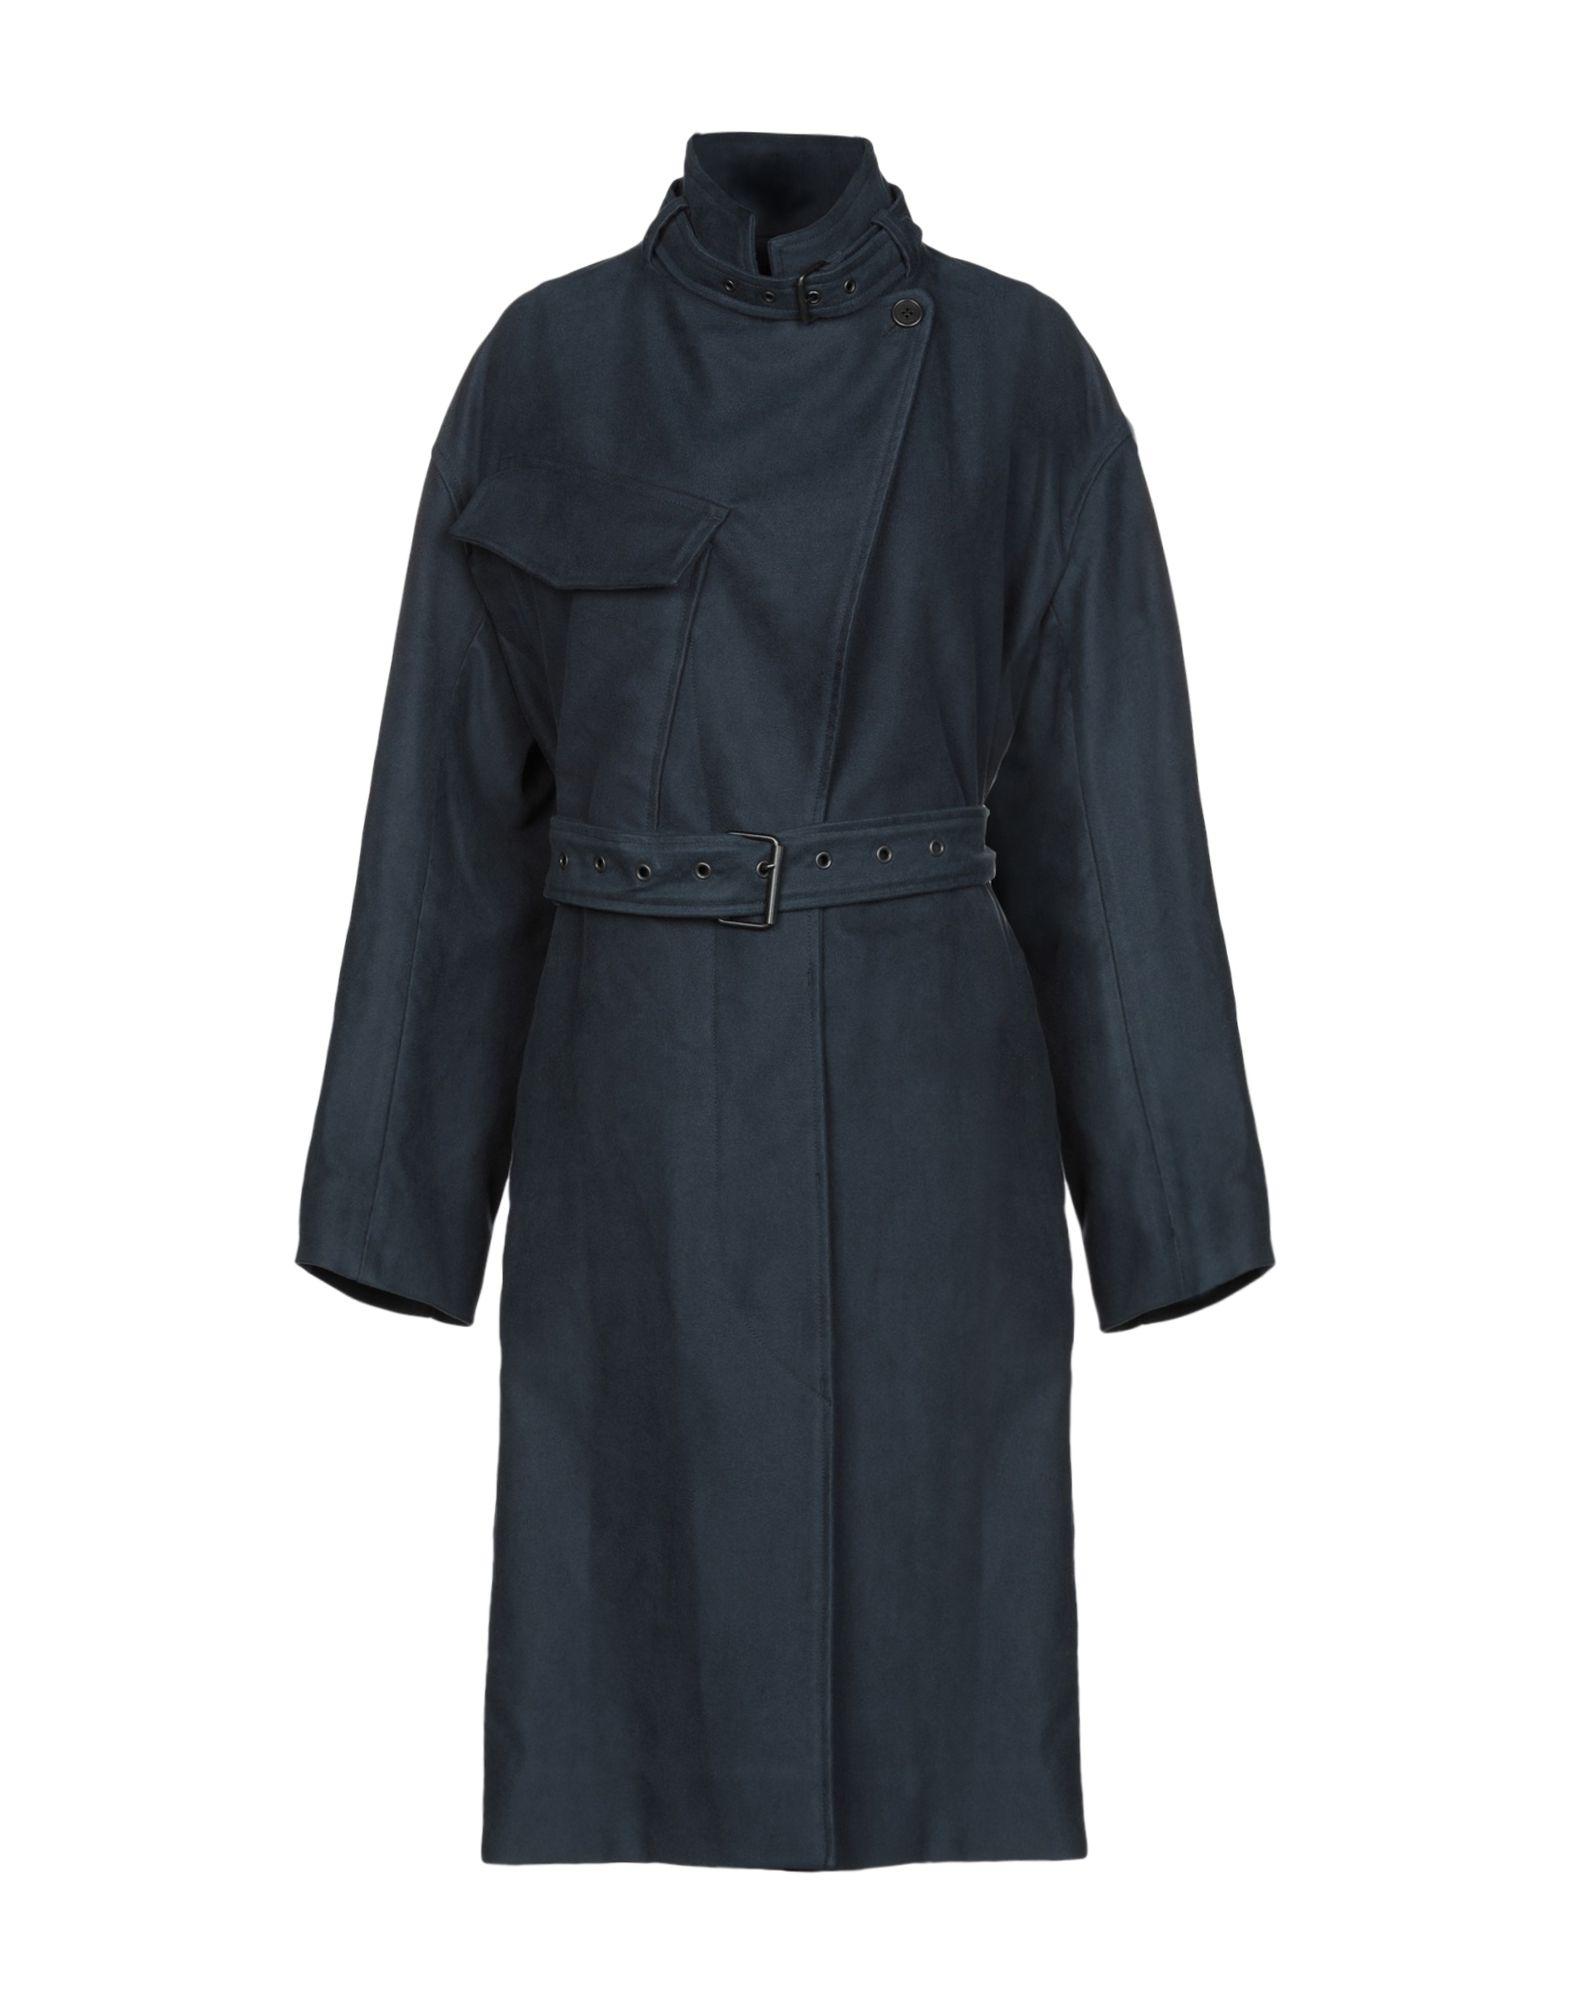 Фото - ISABEL MARANT Пальто isabel marant пальто